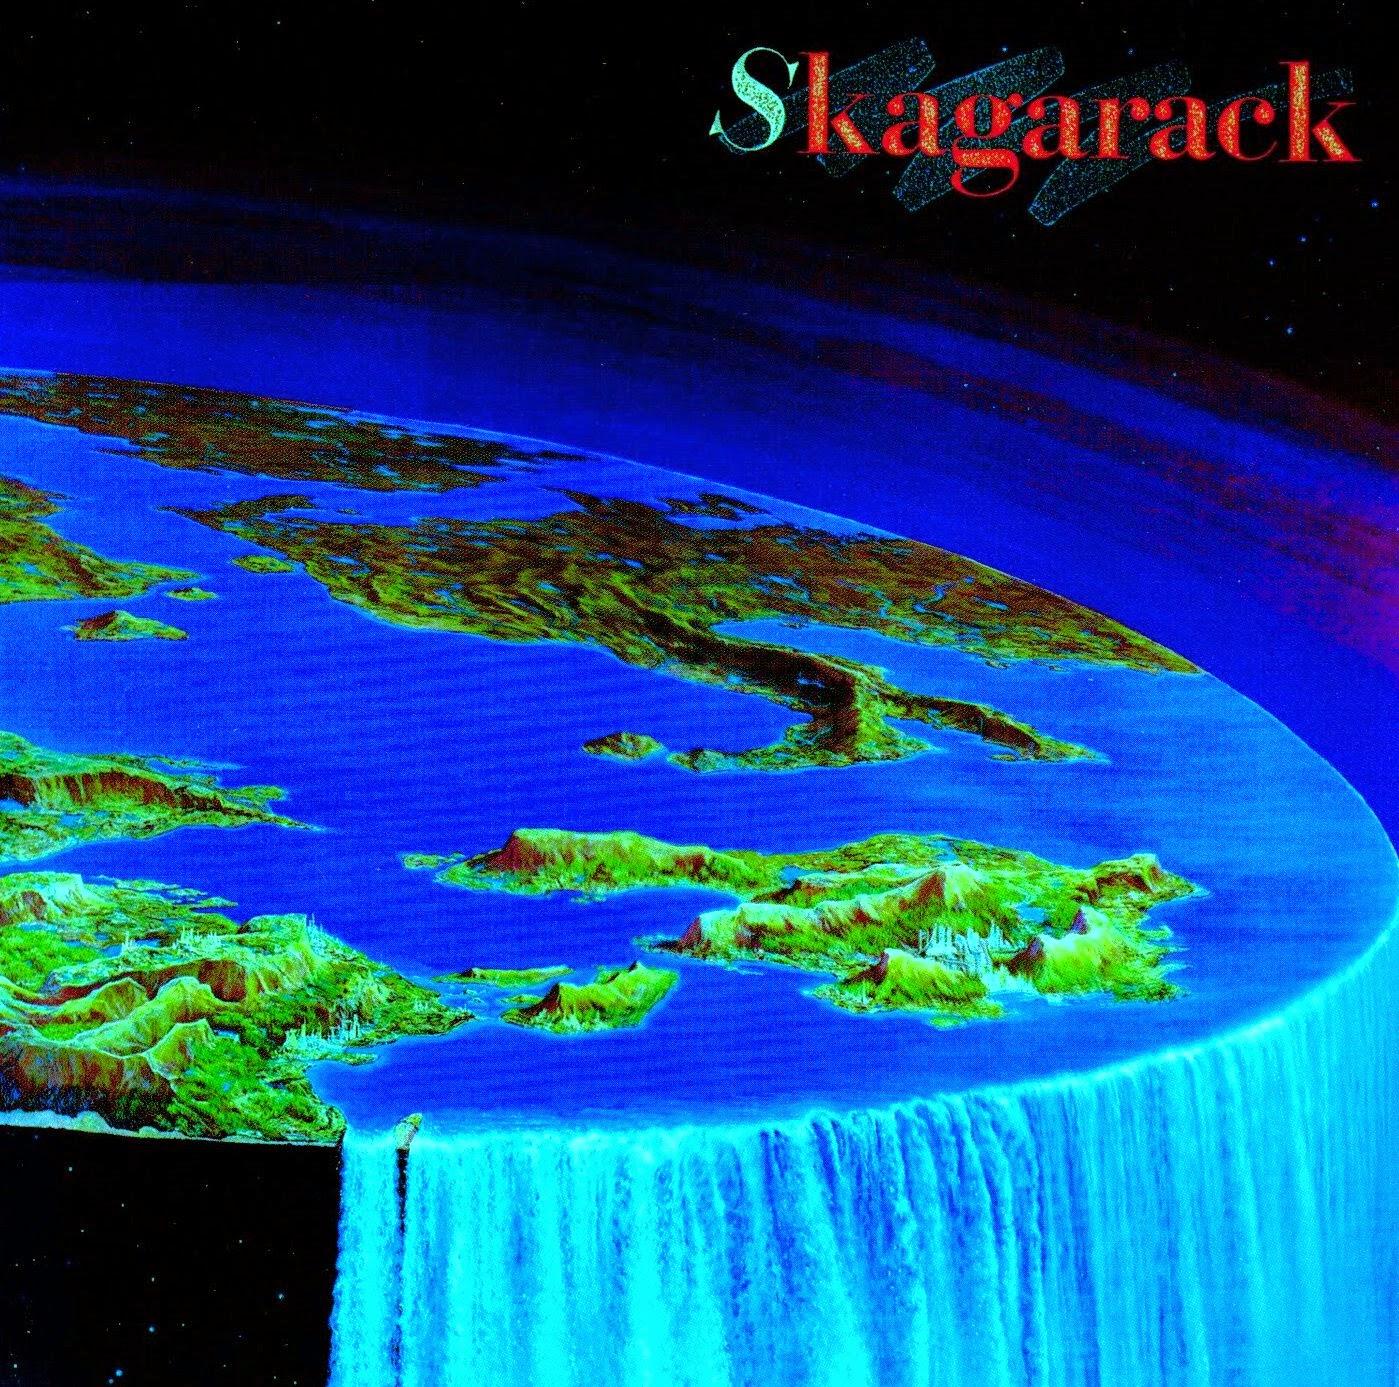 Skagarack st 1986 aor melodic rock music blogspot bands albums